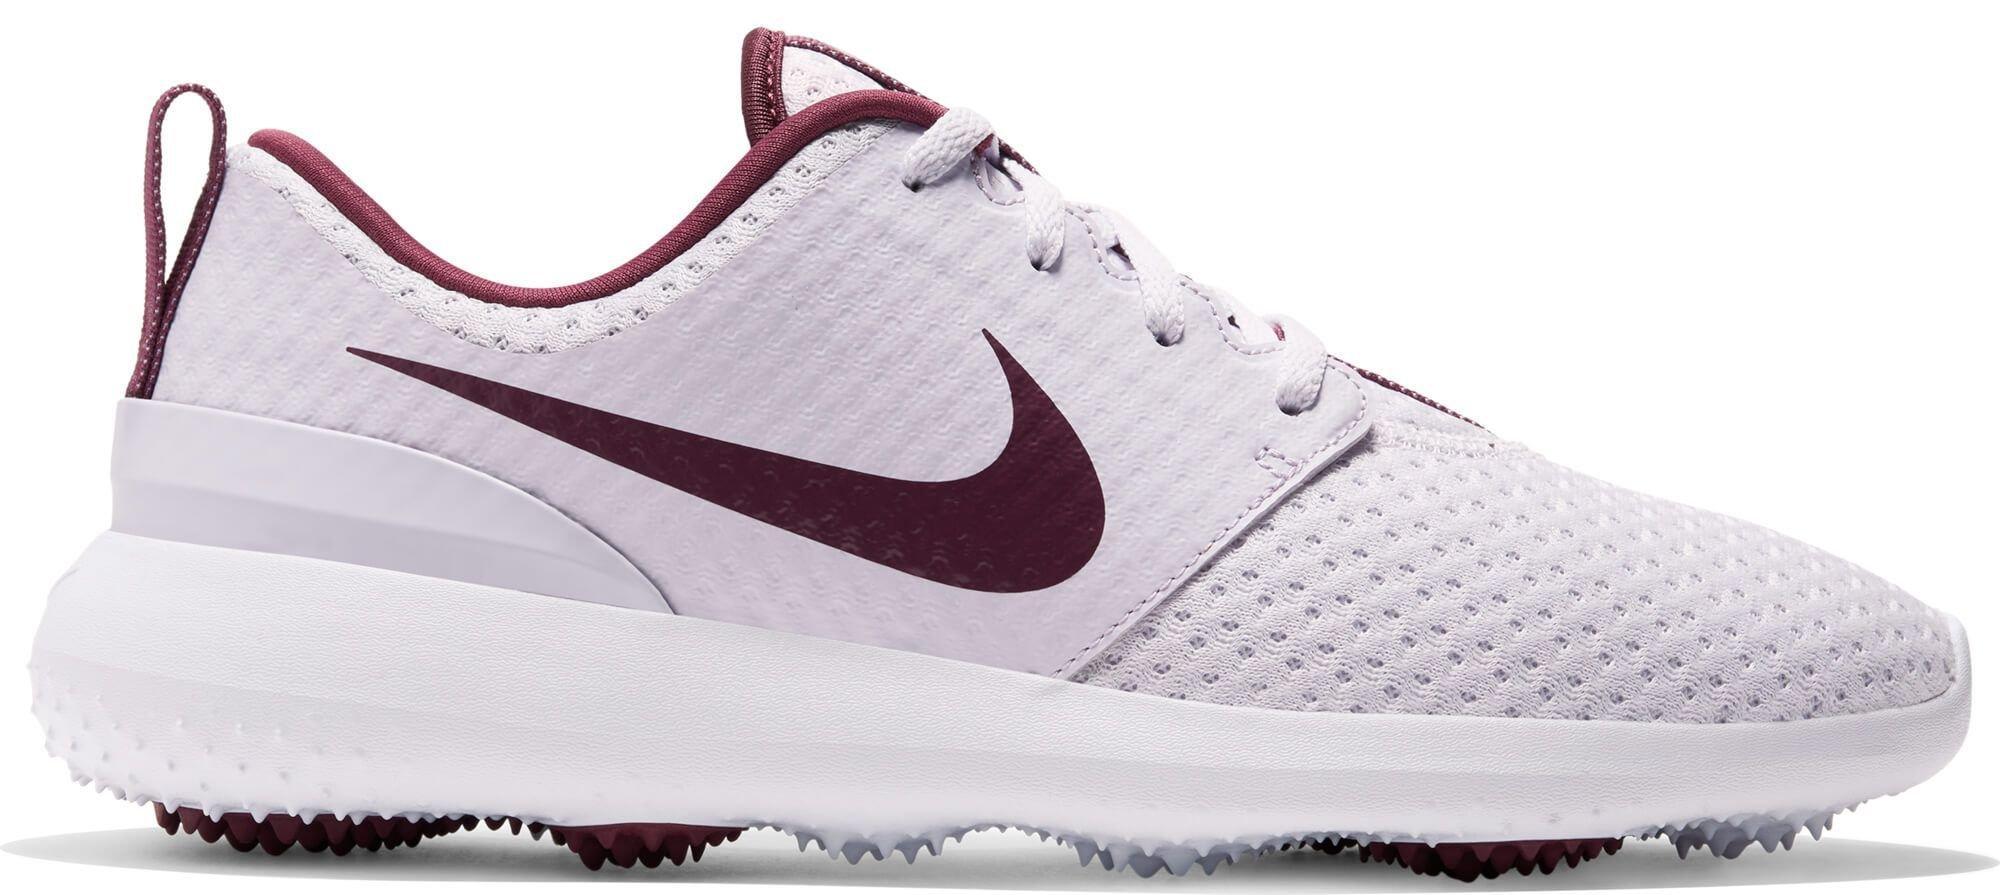 Café Procesando lector  Nike Women's Roshe G Golf Shoes 2020 Barely Grape/Villain Red/White -  Carl's Golfland